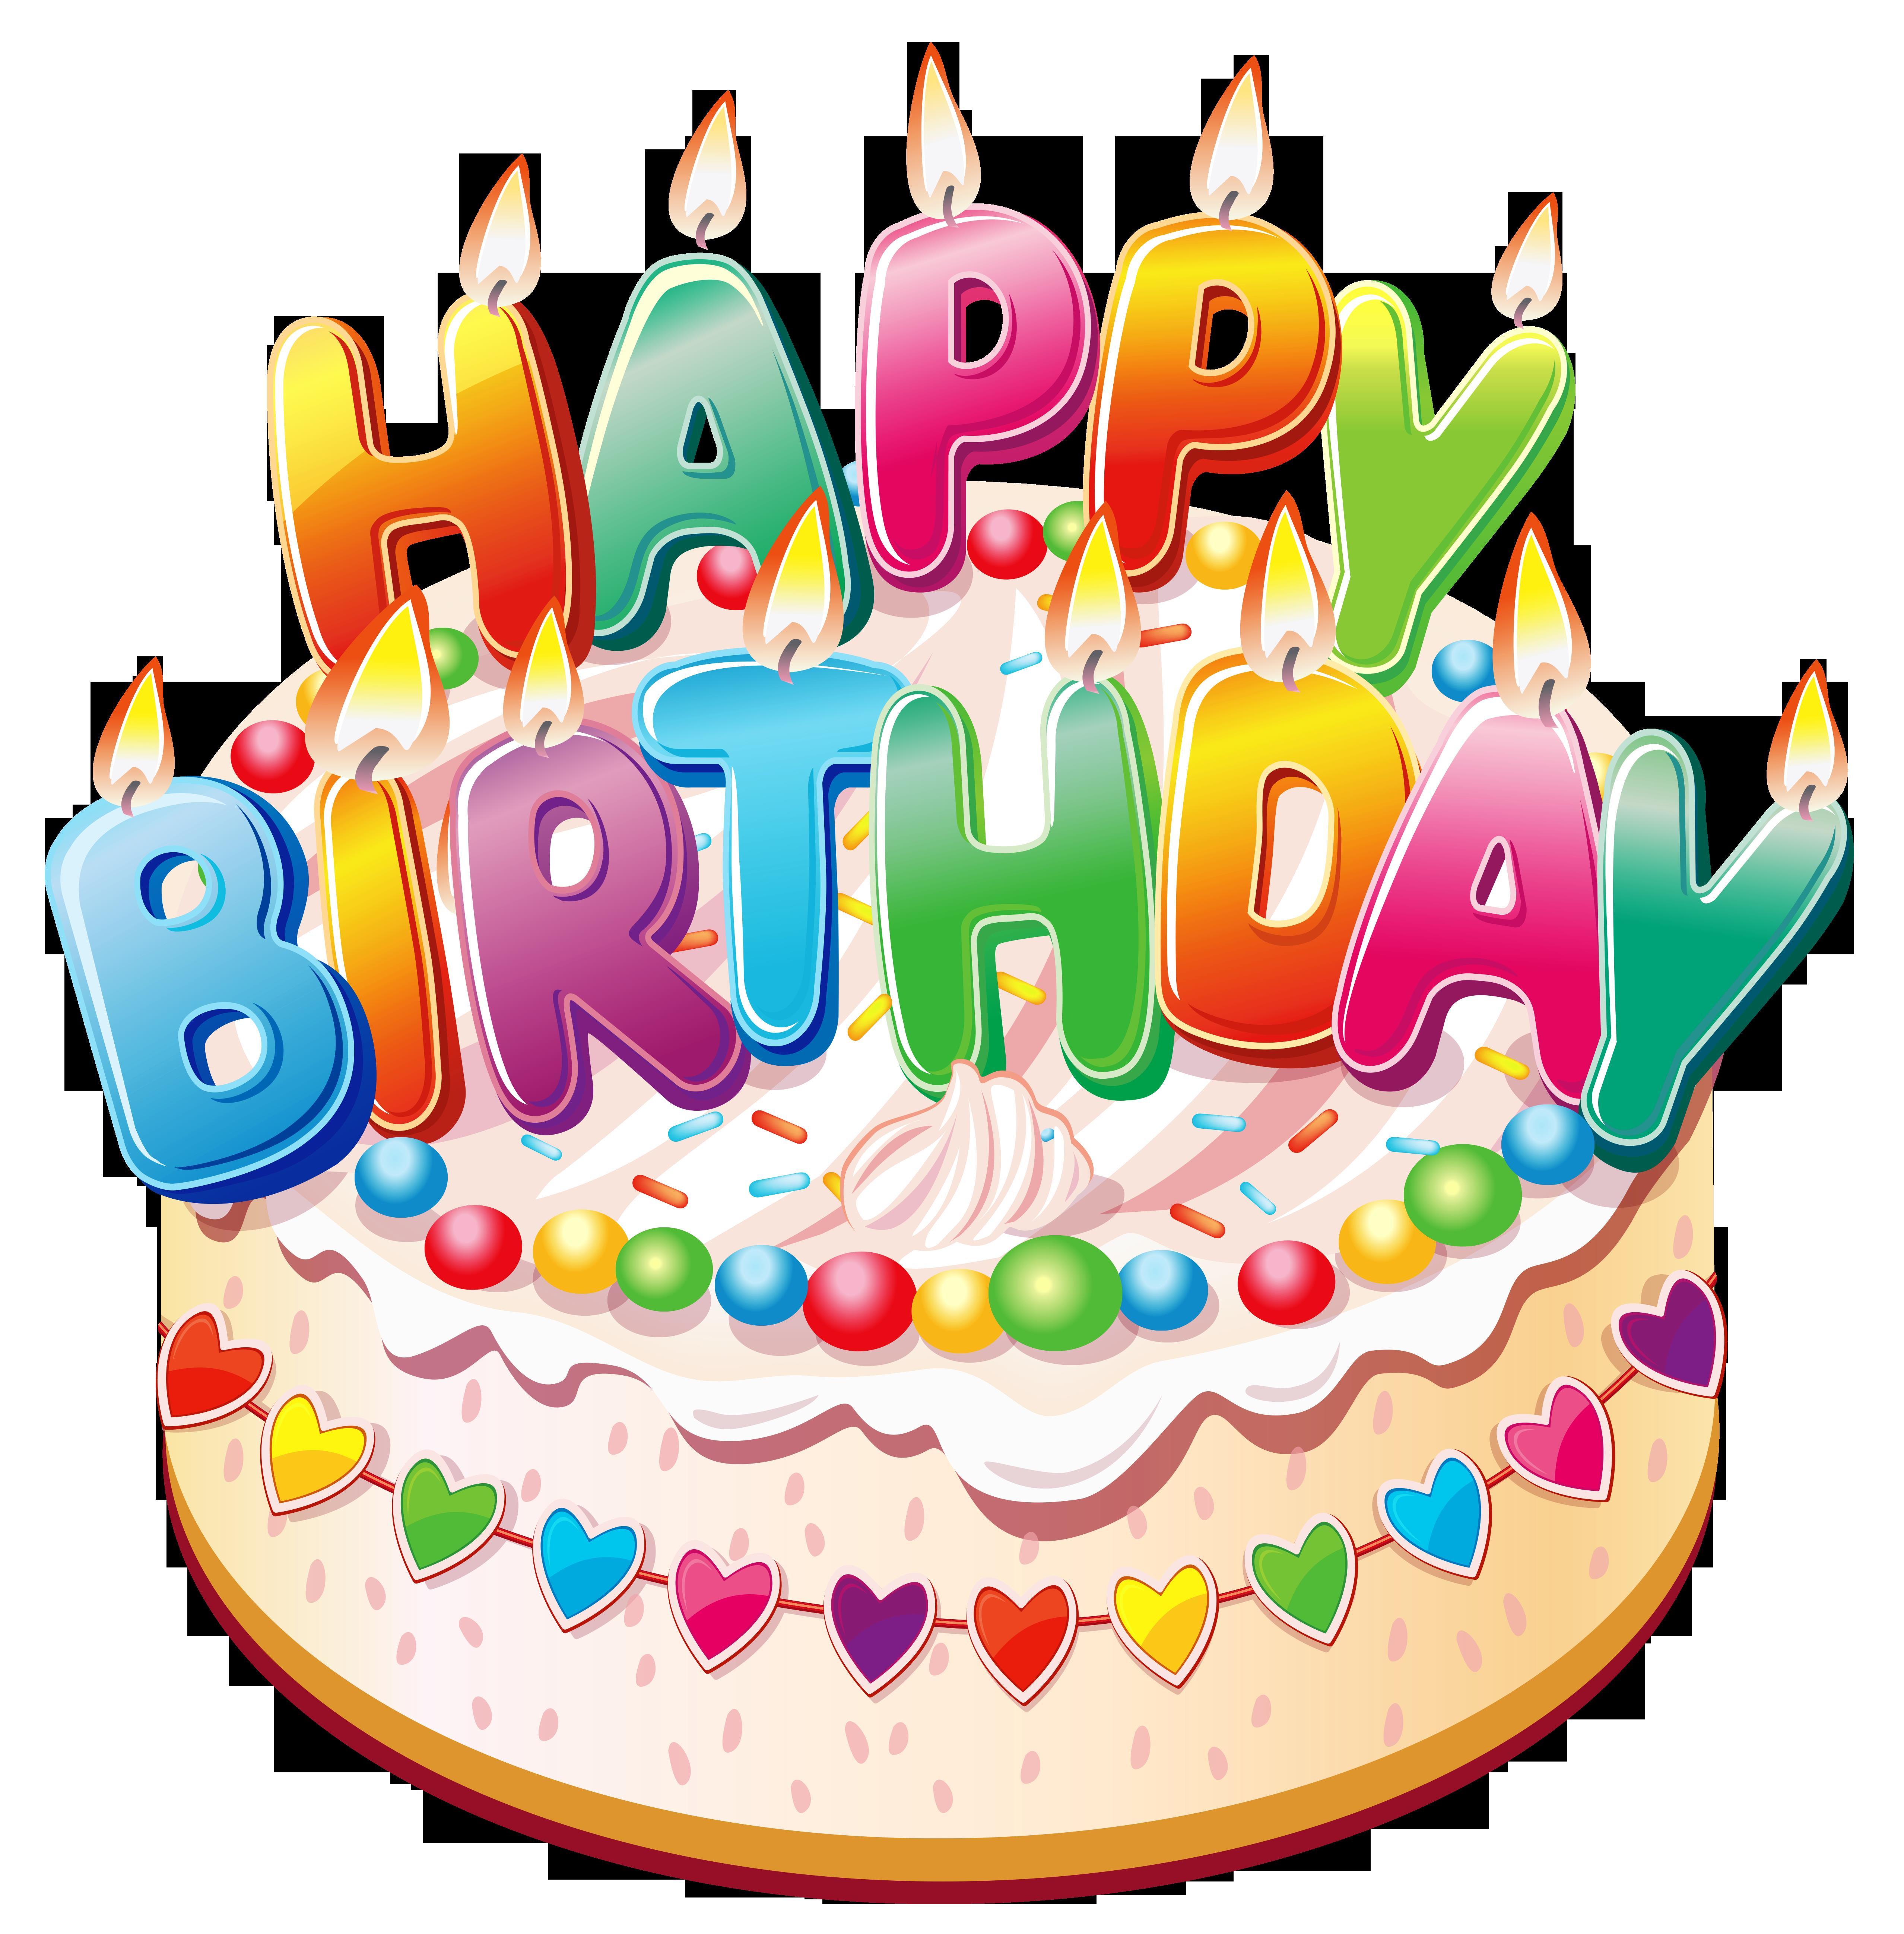 Cake clipart tart. Birthday images best happy